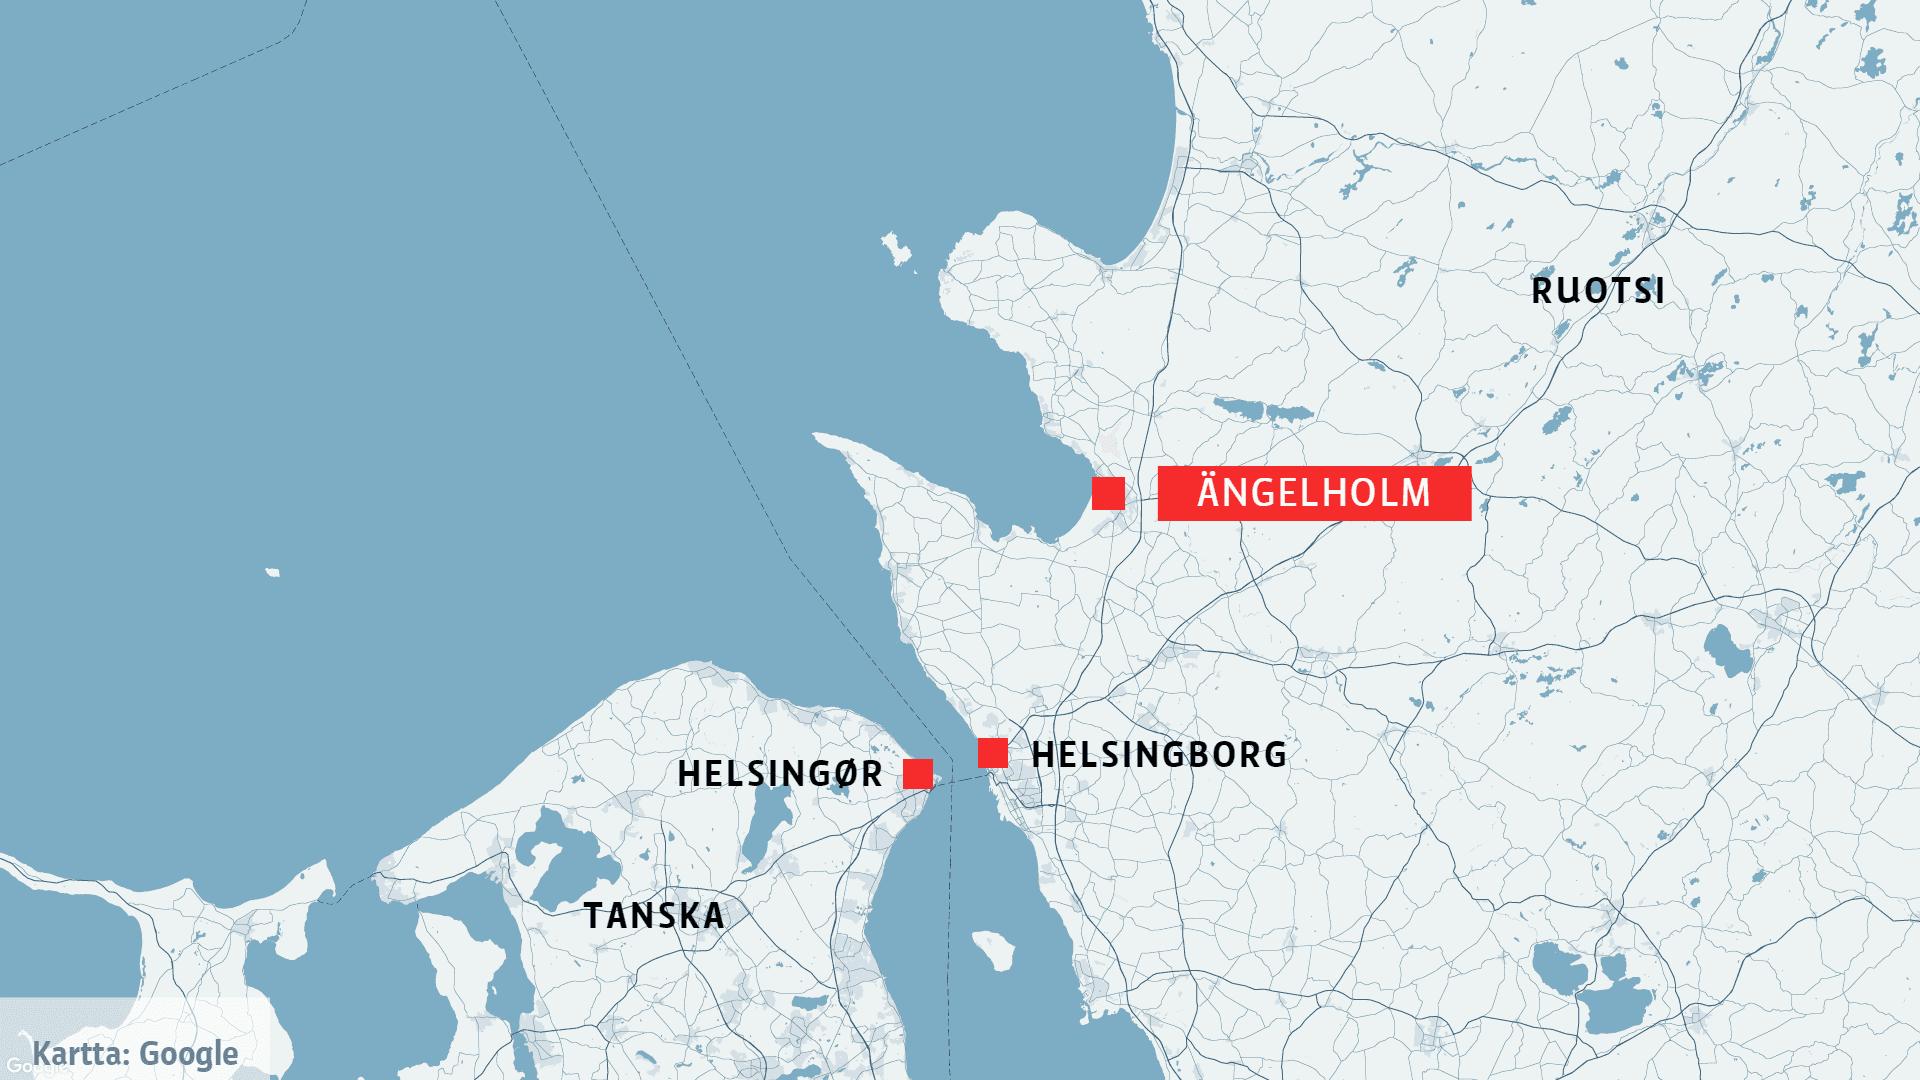 Kartta, johon on merkitty Ängelholm, Helsingborg ja Helsingør.